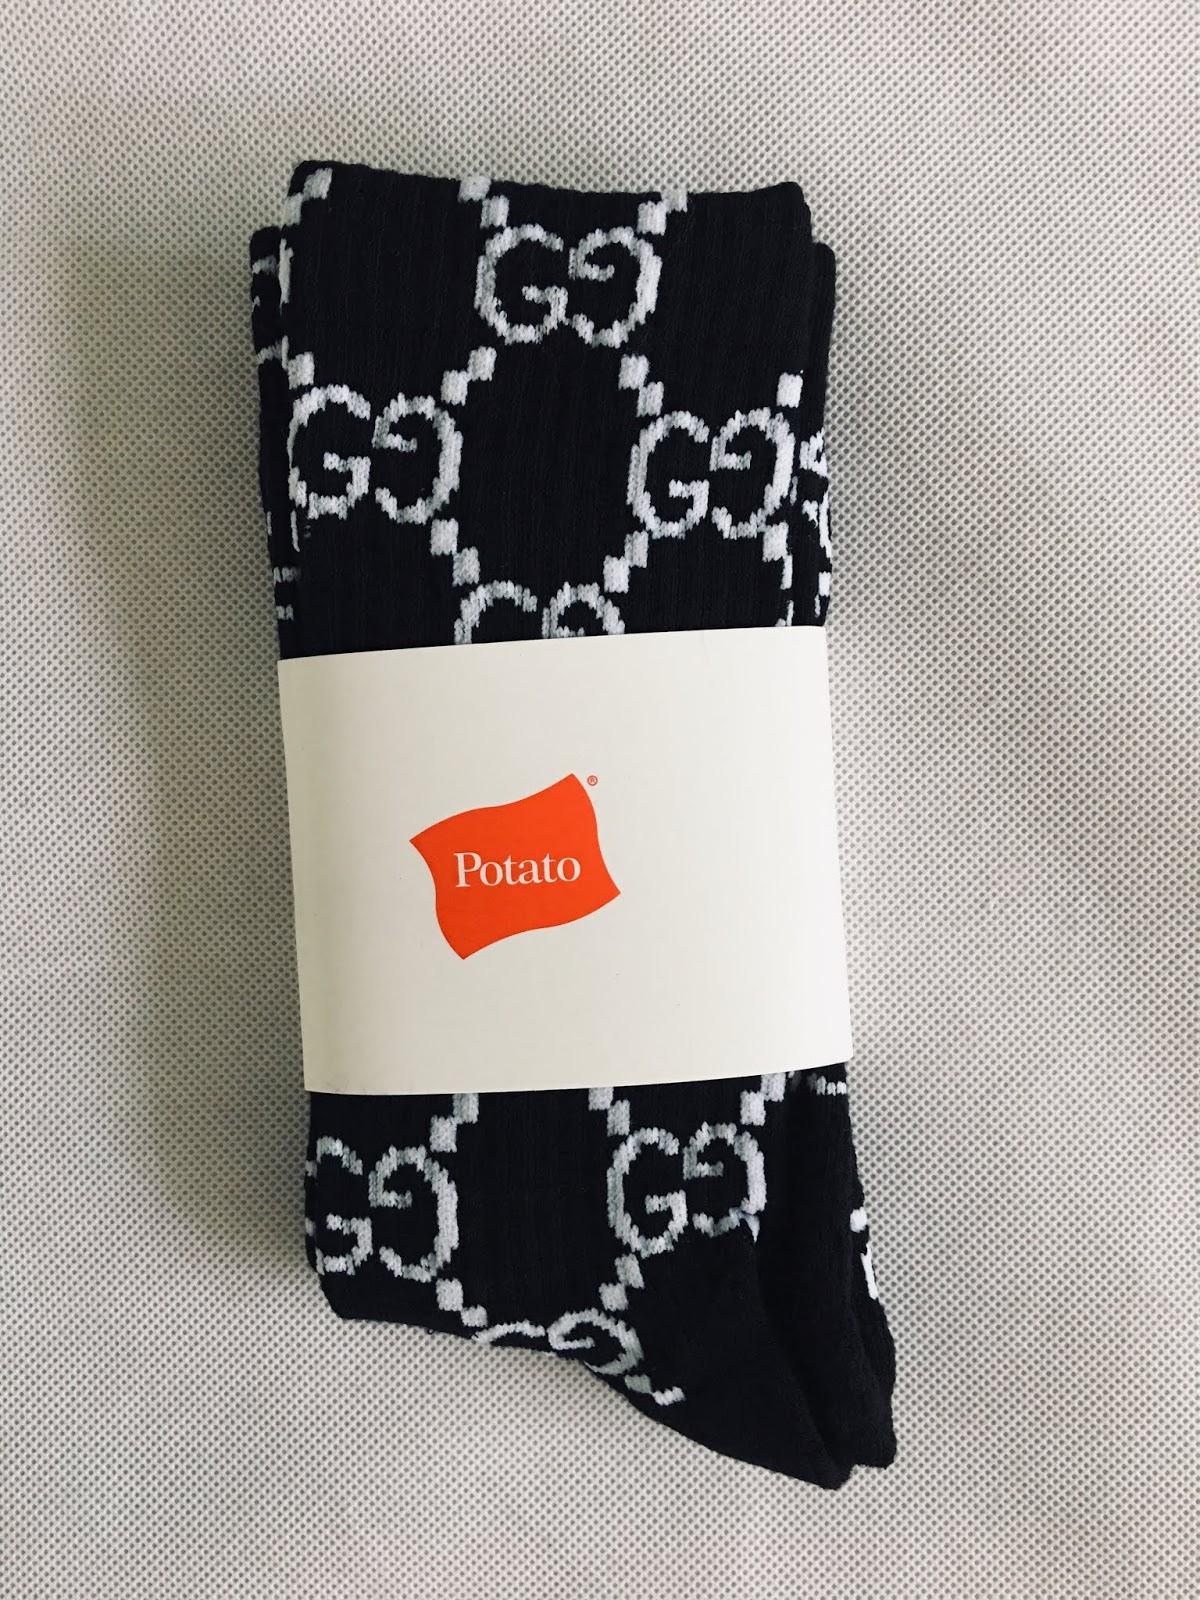 4a261bd5bec Imran Potato Black Colorway Gucci Socks